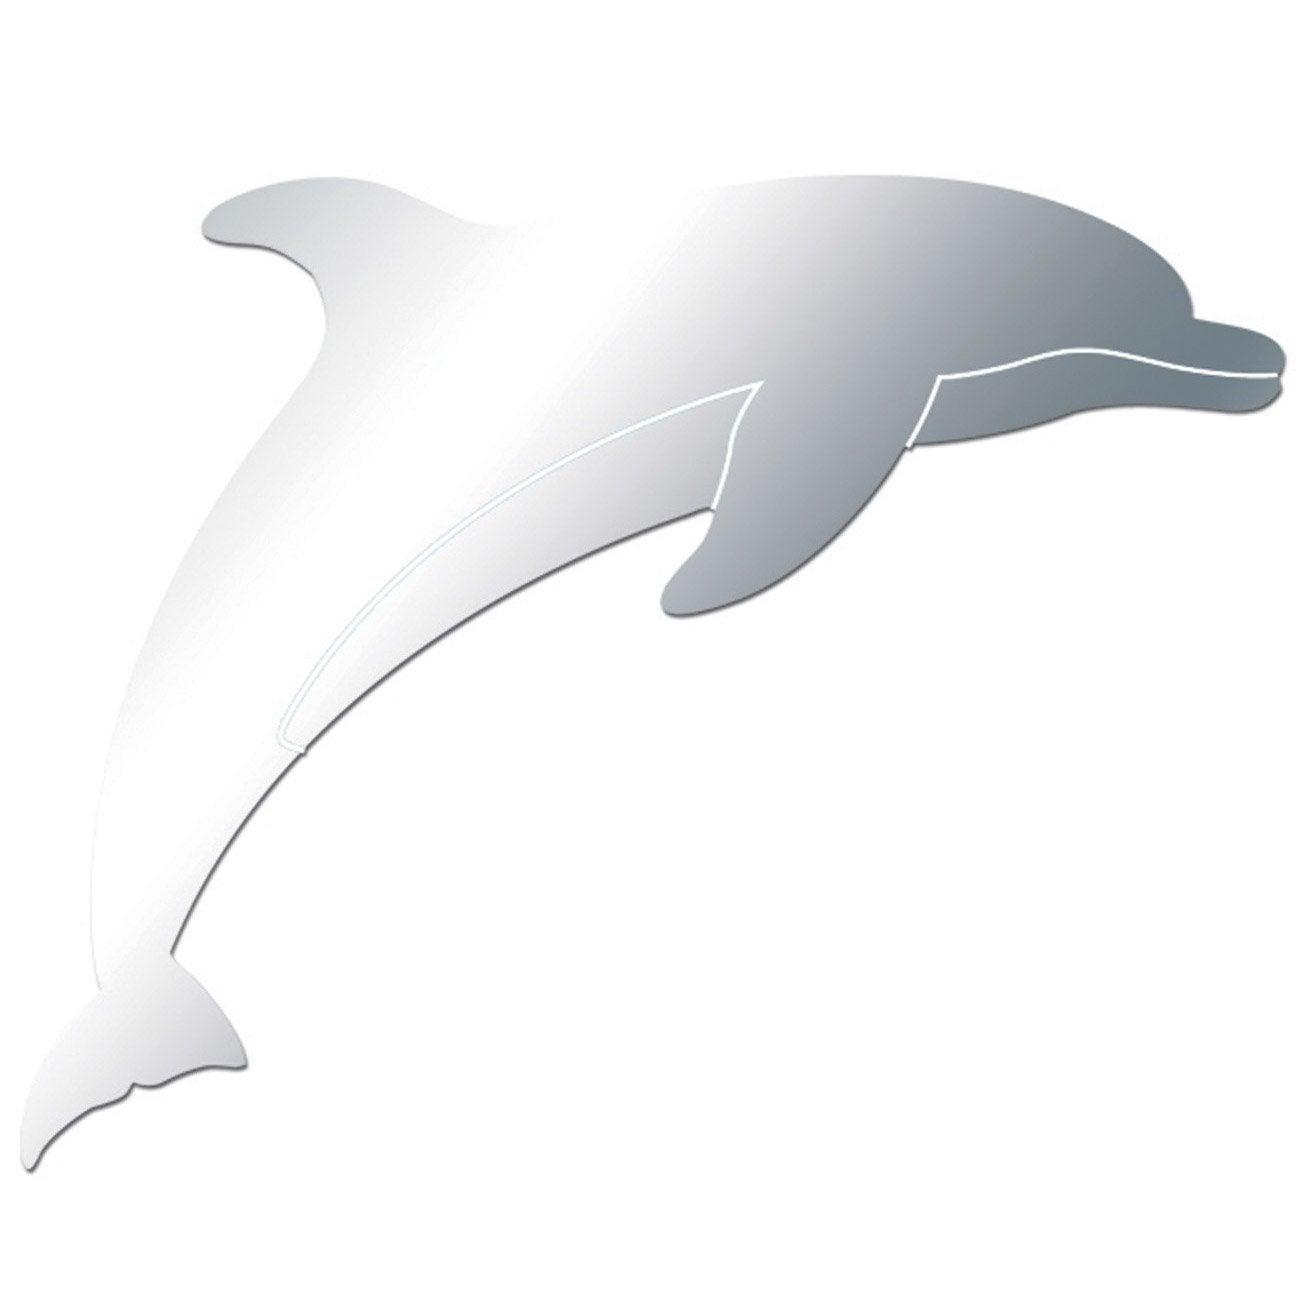 miroir en plexiglass dauphin 10 cm x 10 cm leroy merlin. Black Bedroom Furniture Sets. Home Design Ideas